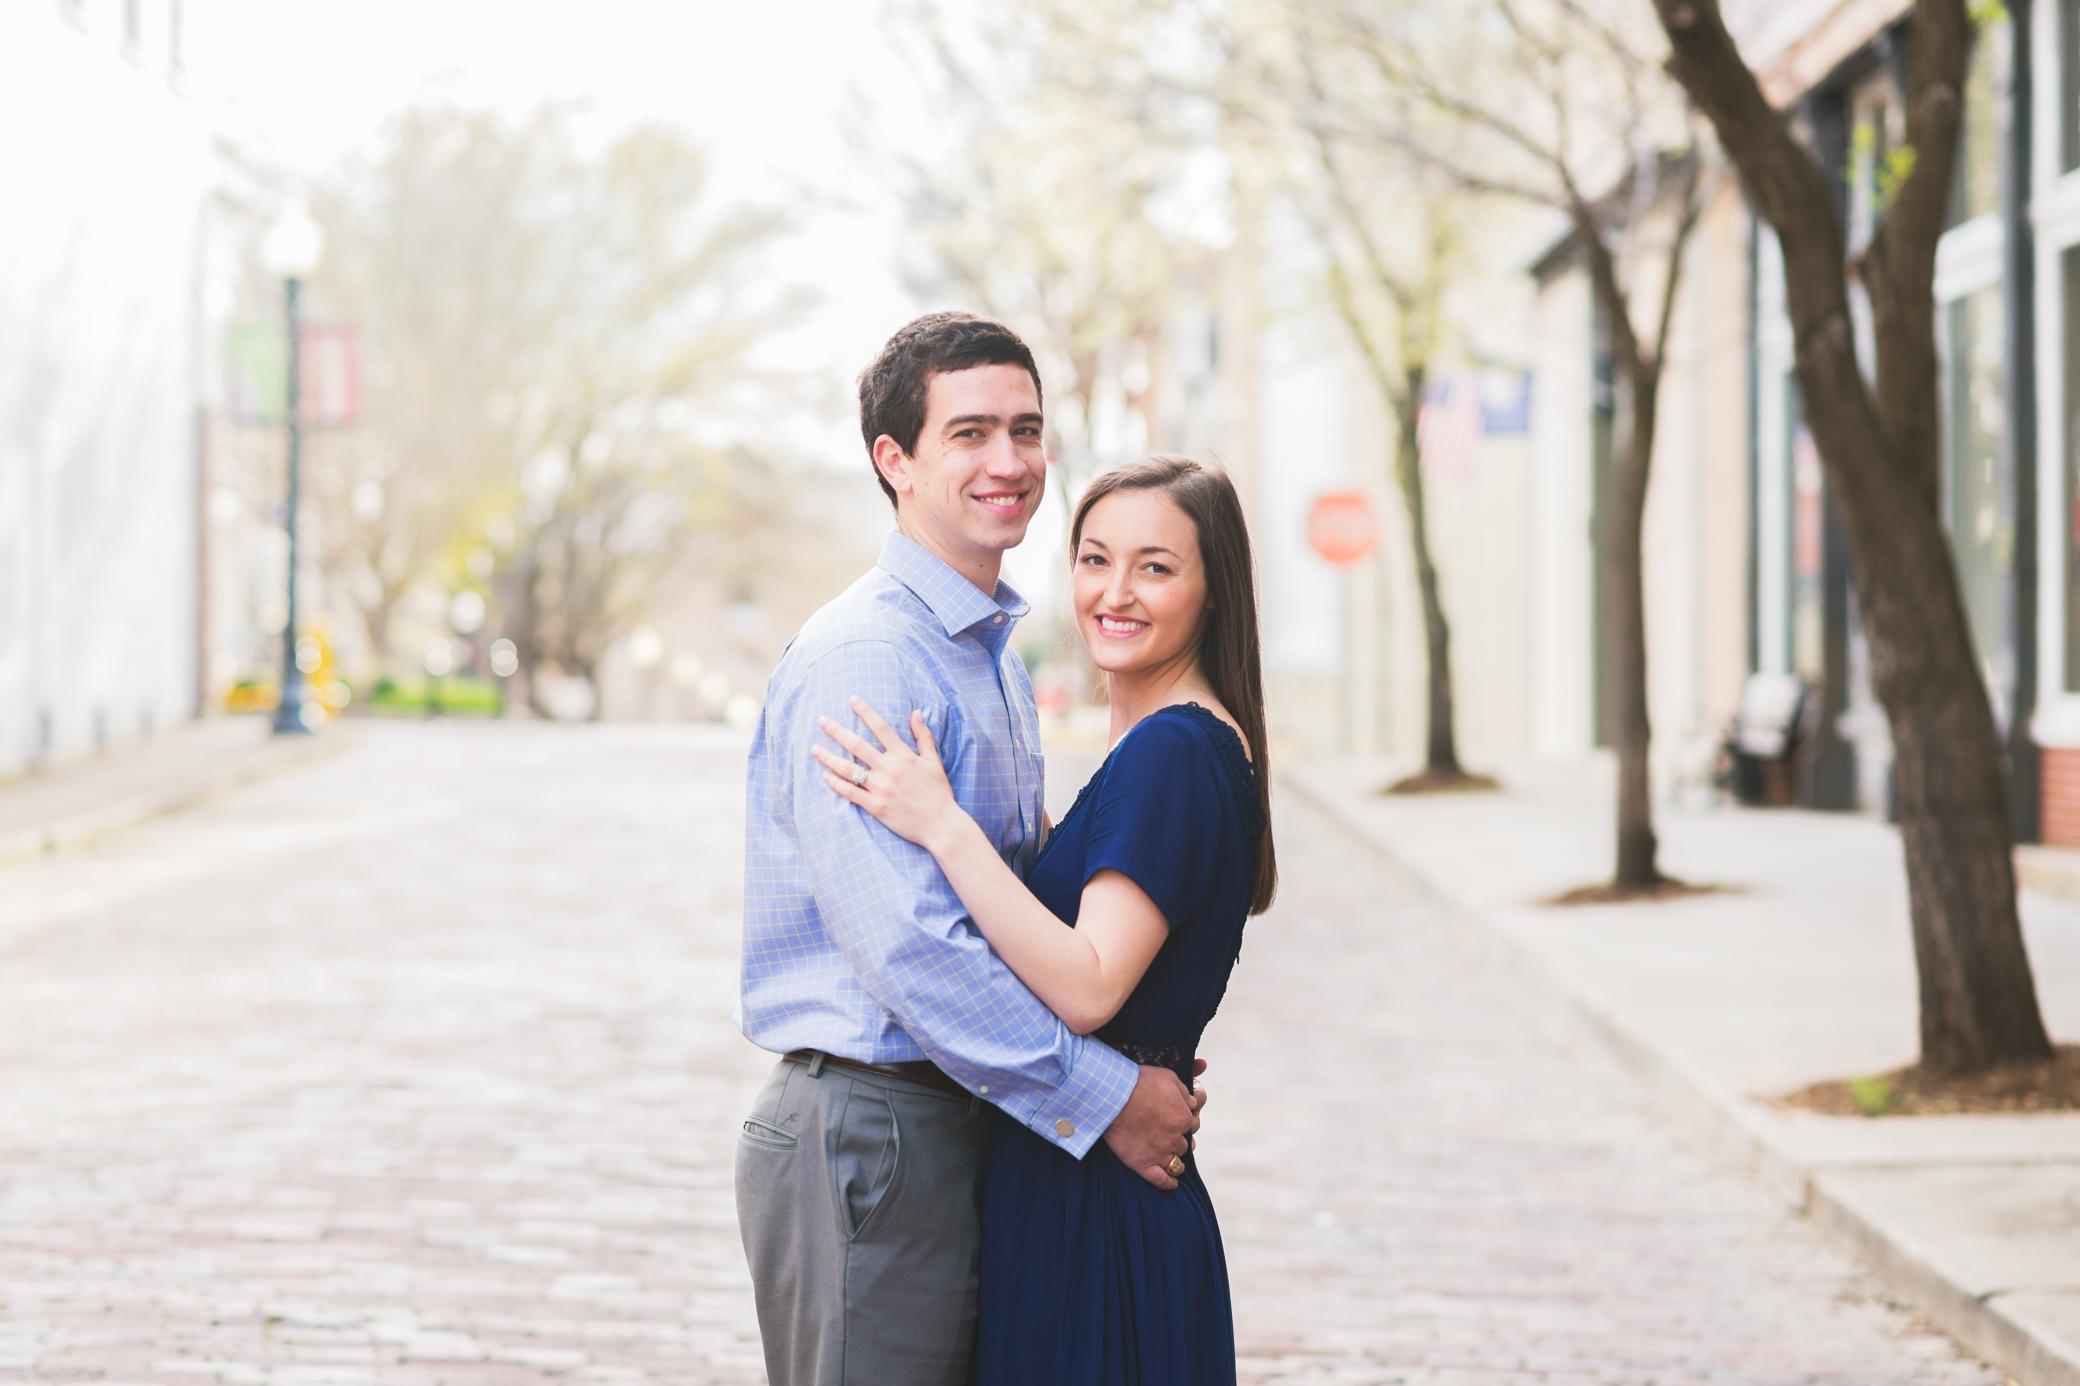 Engagement_Jason&ShelbyMohn_edits-11.jpg